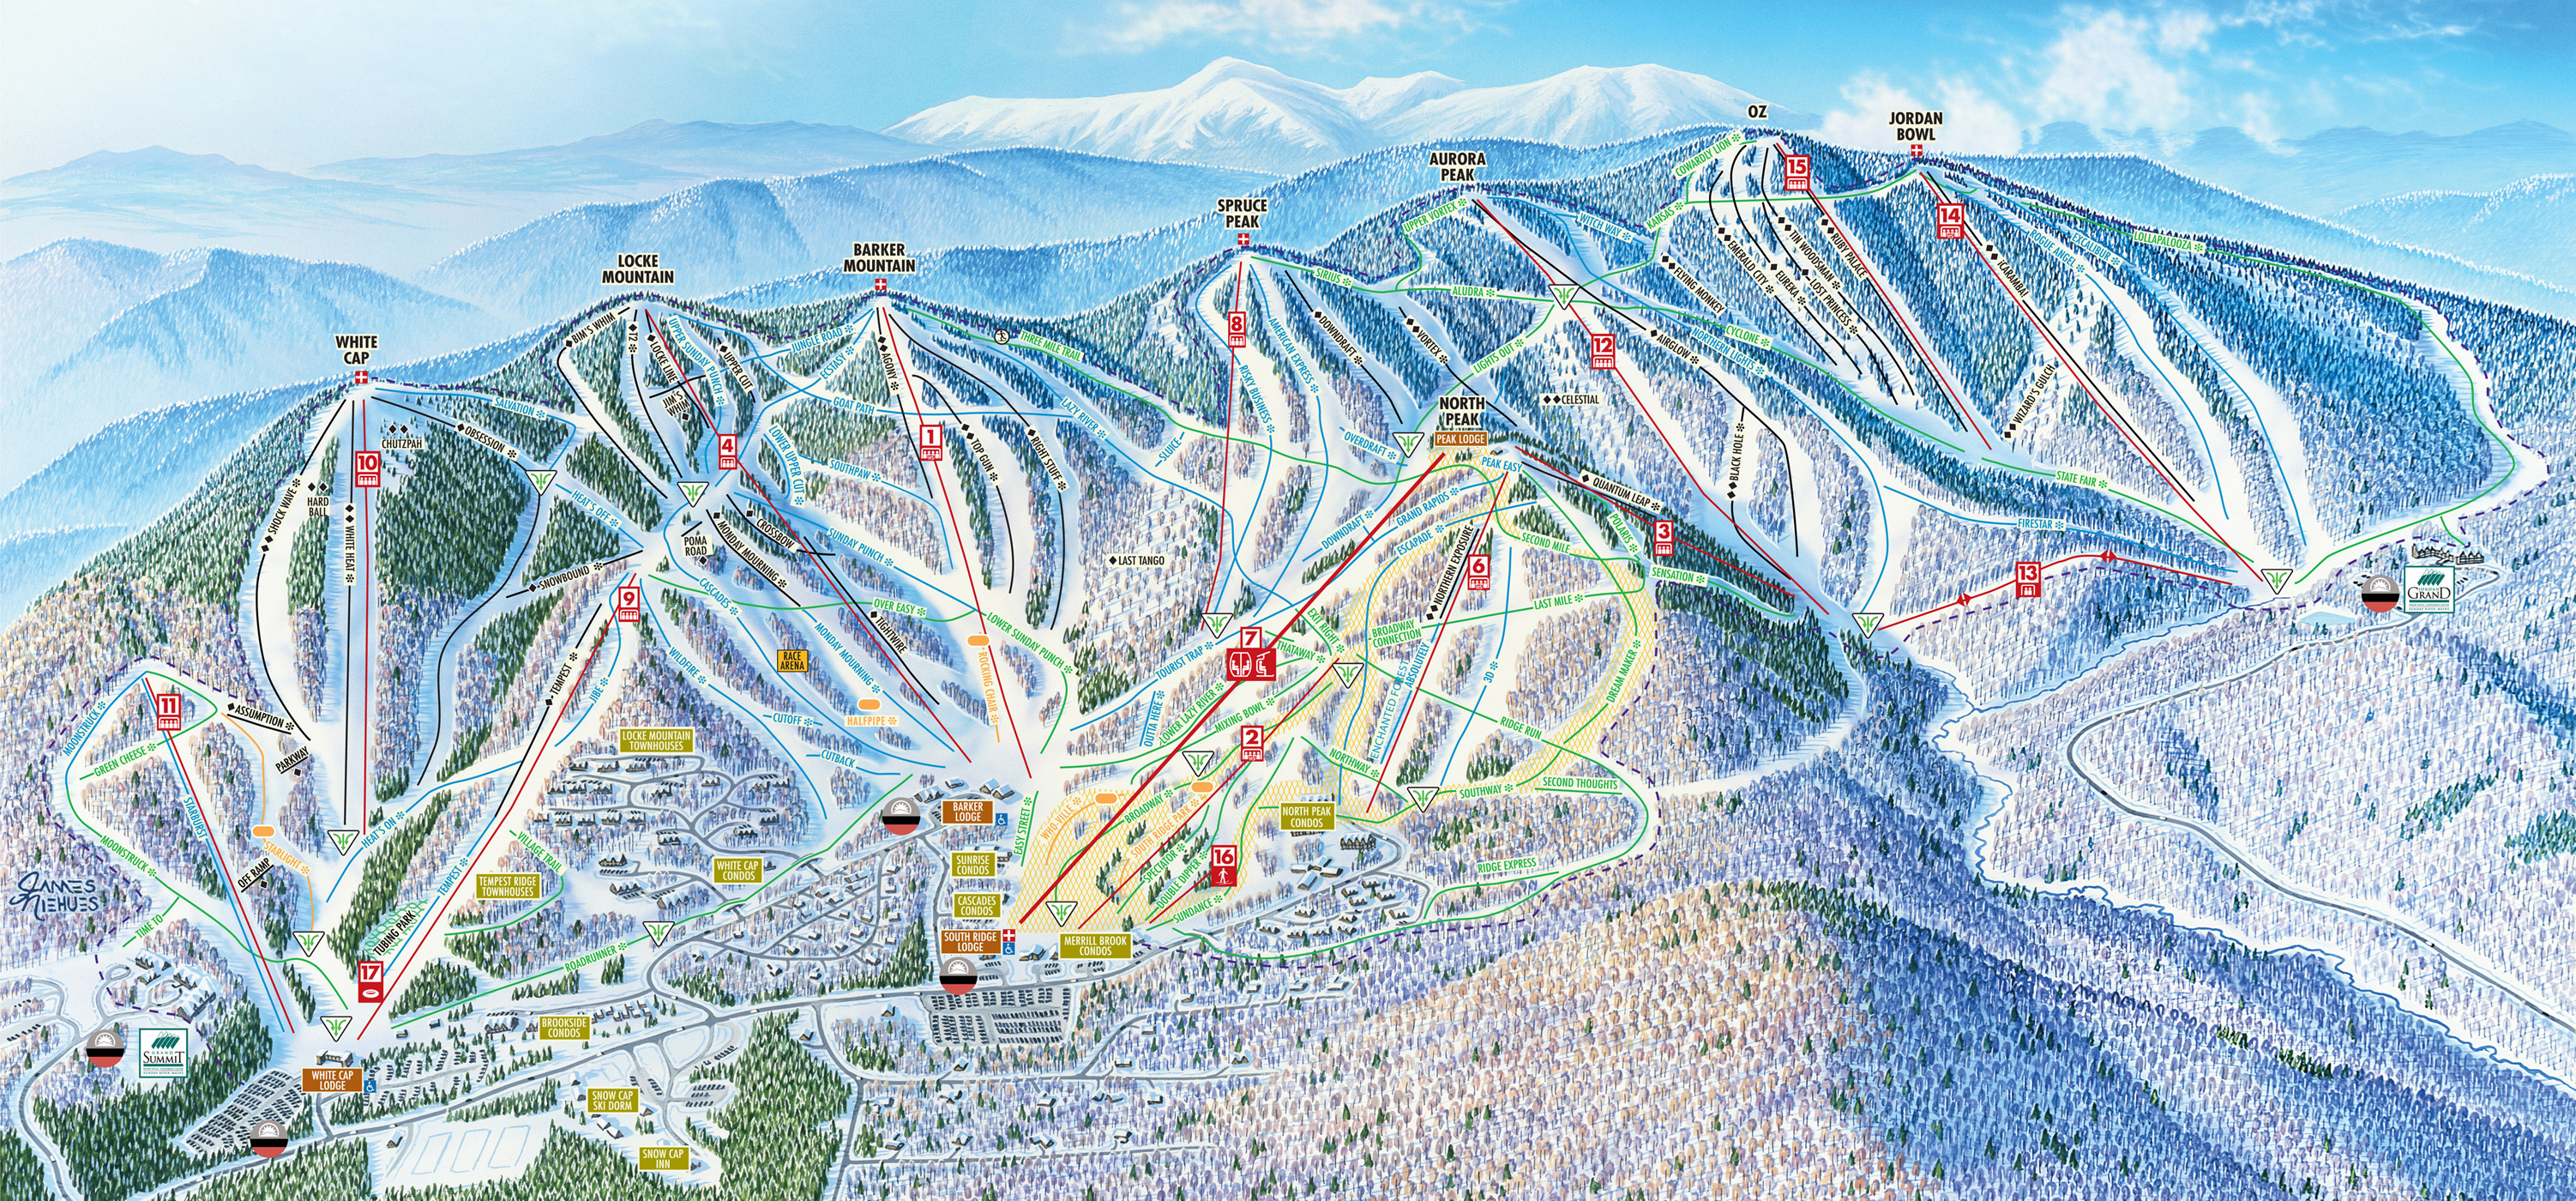 Ski Resort Map Usa on